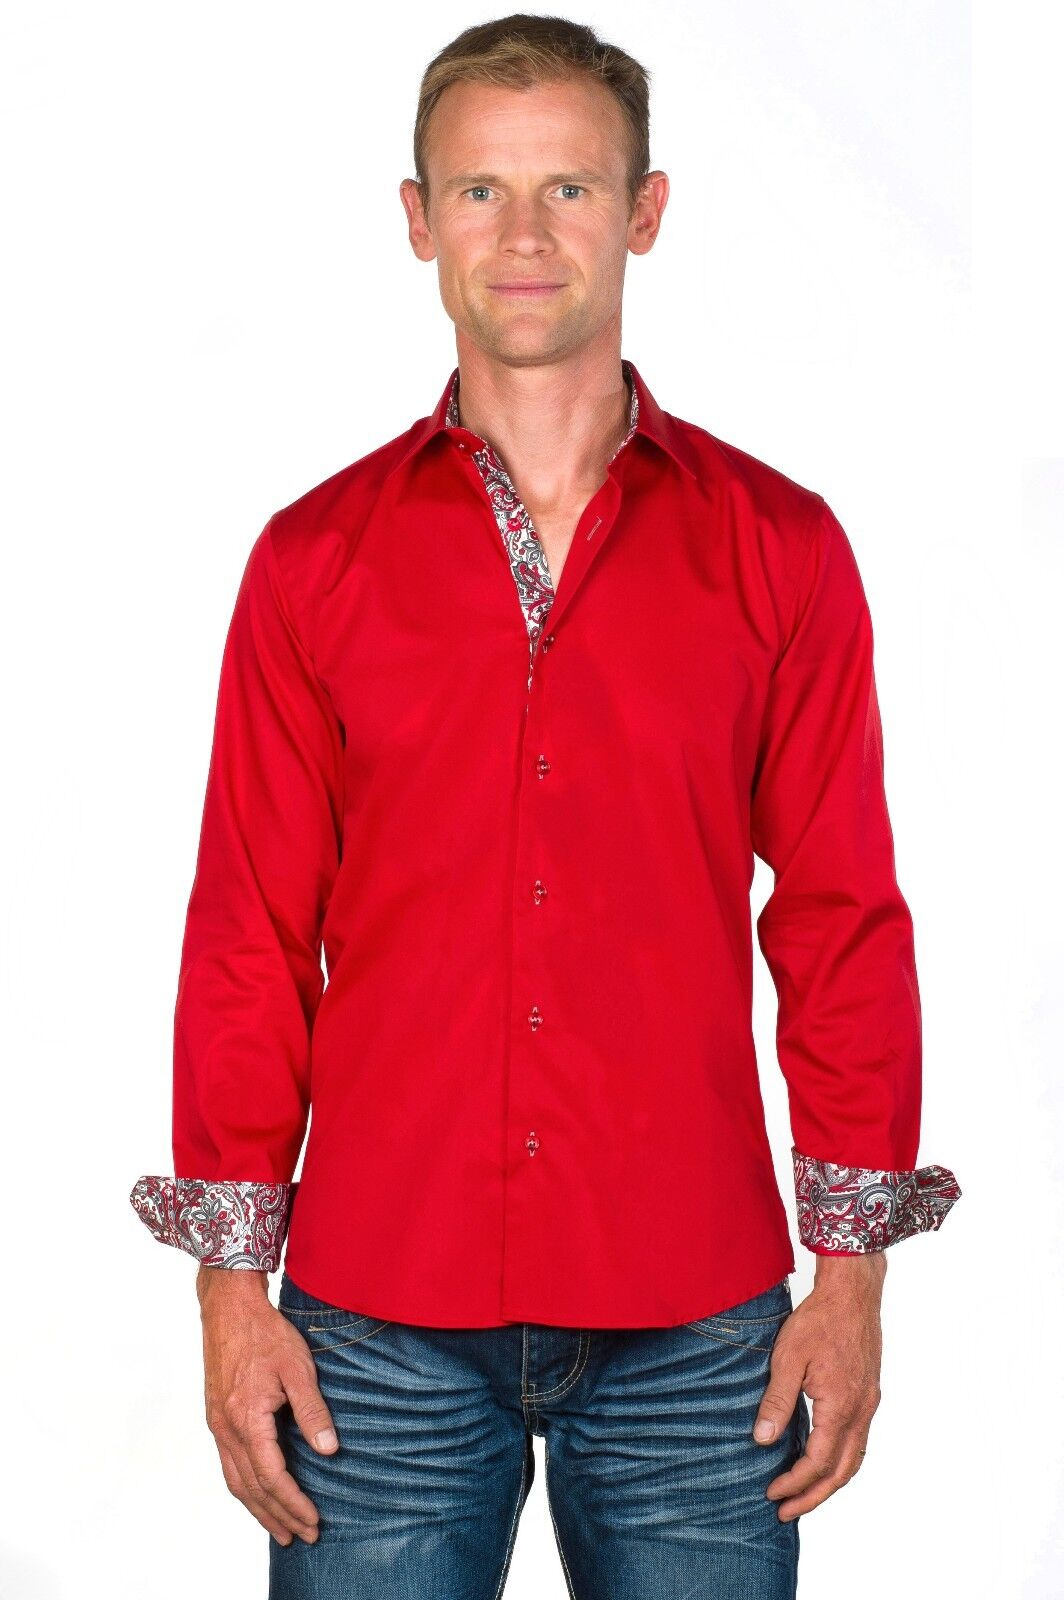 Ugholin Men's Slim Fit Easy Iron Cotton Long Sleeve Red Dress Shirt